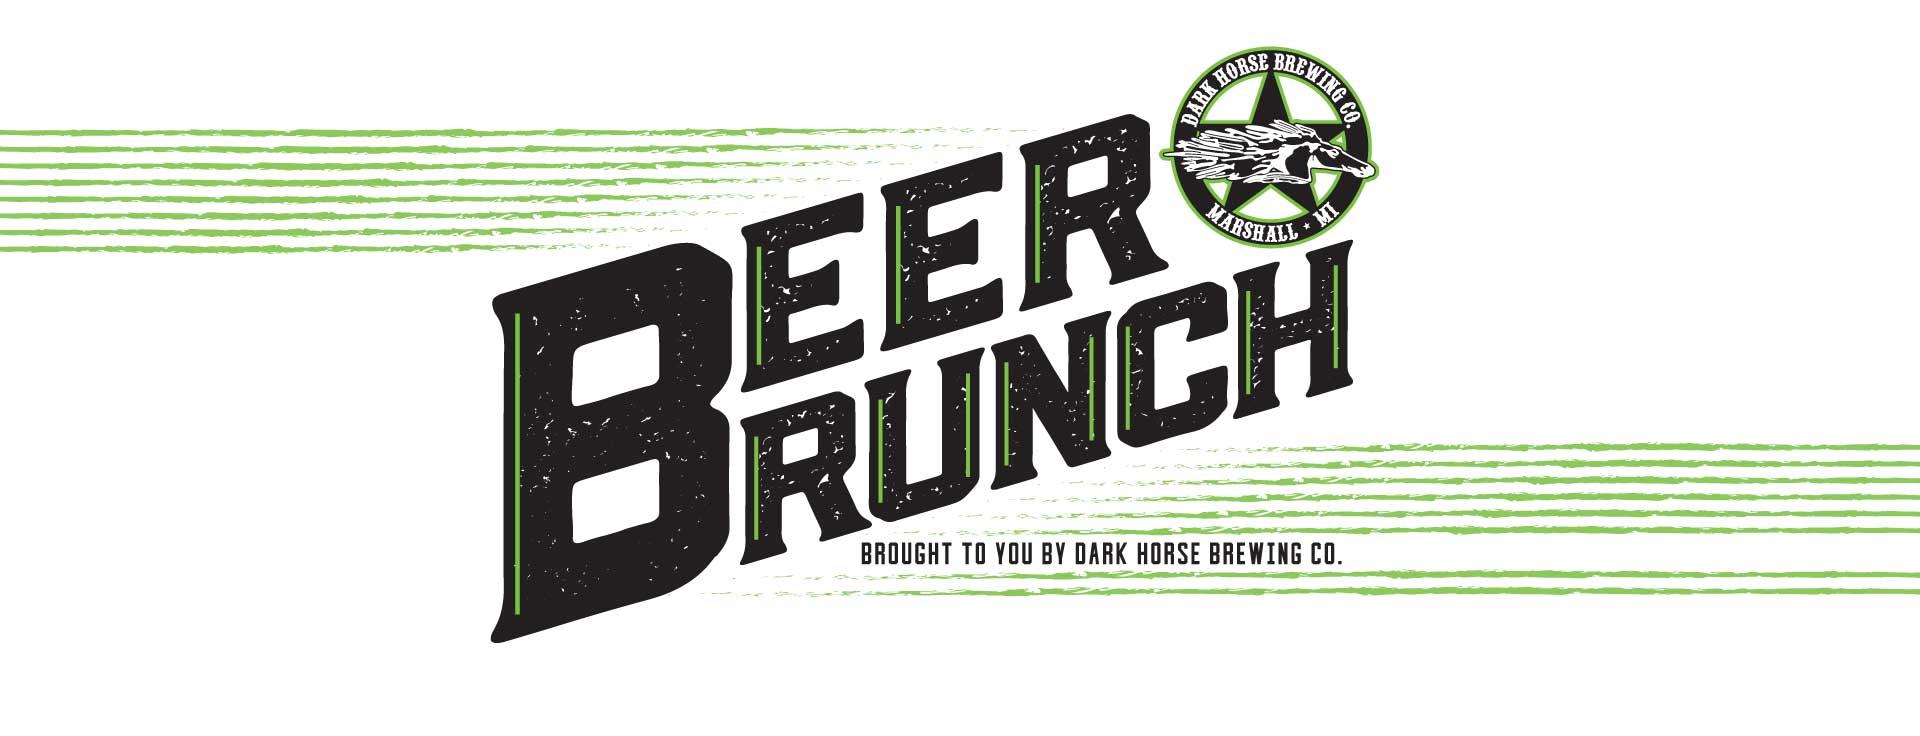 Beer-Brunch-FB-Cover.jpg